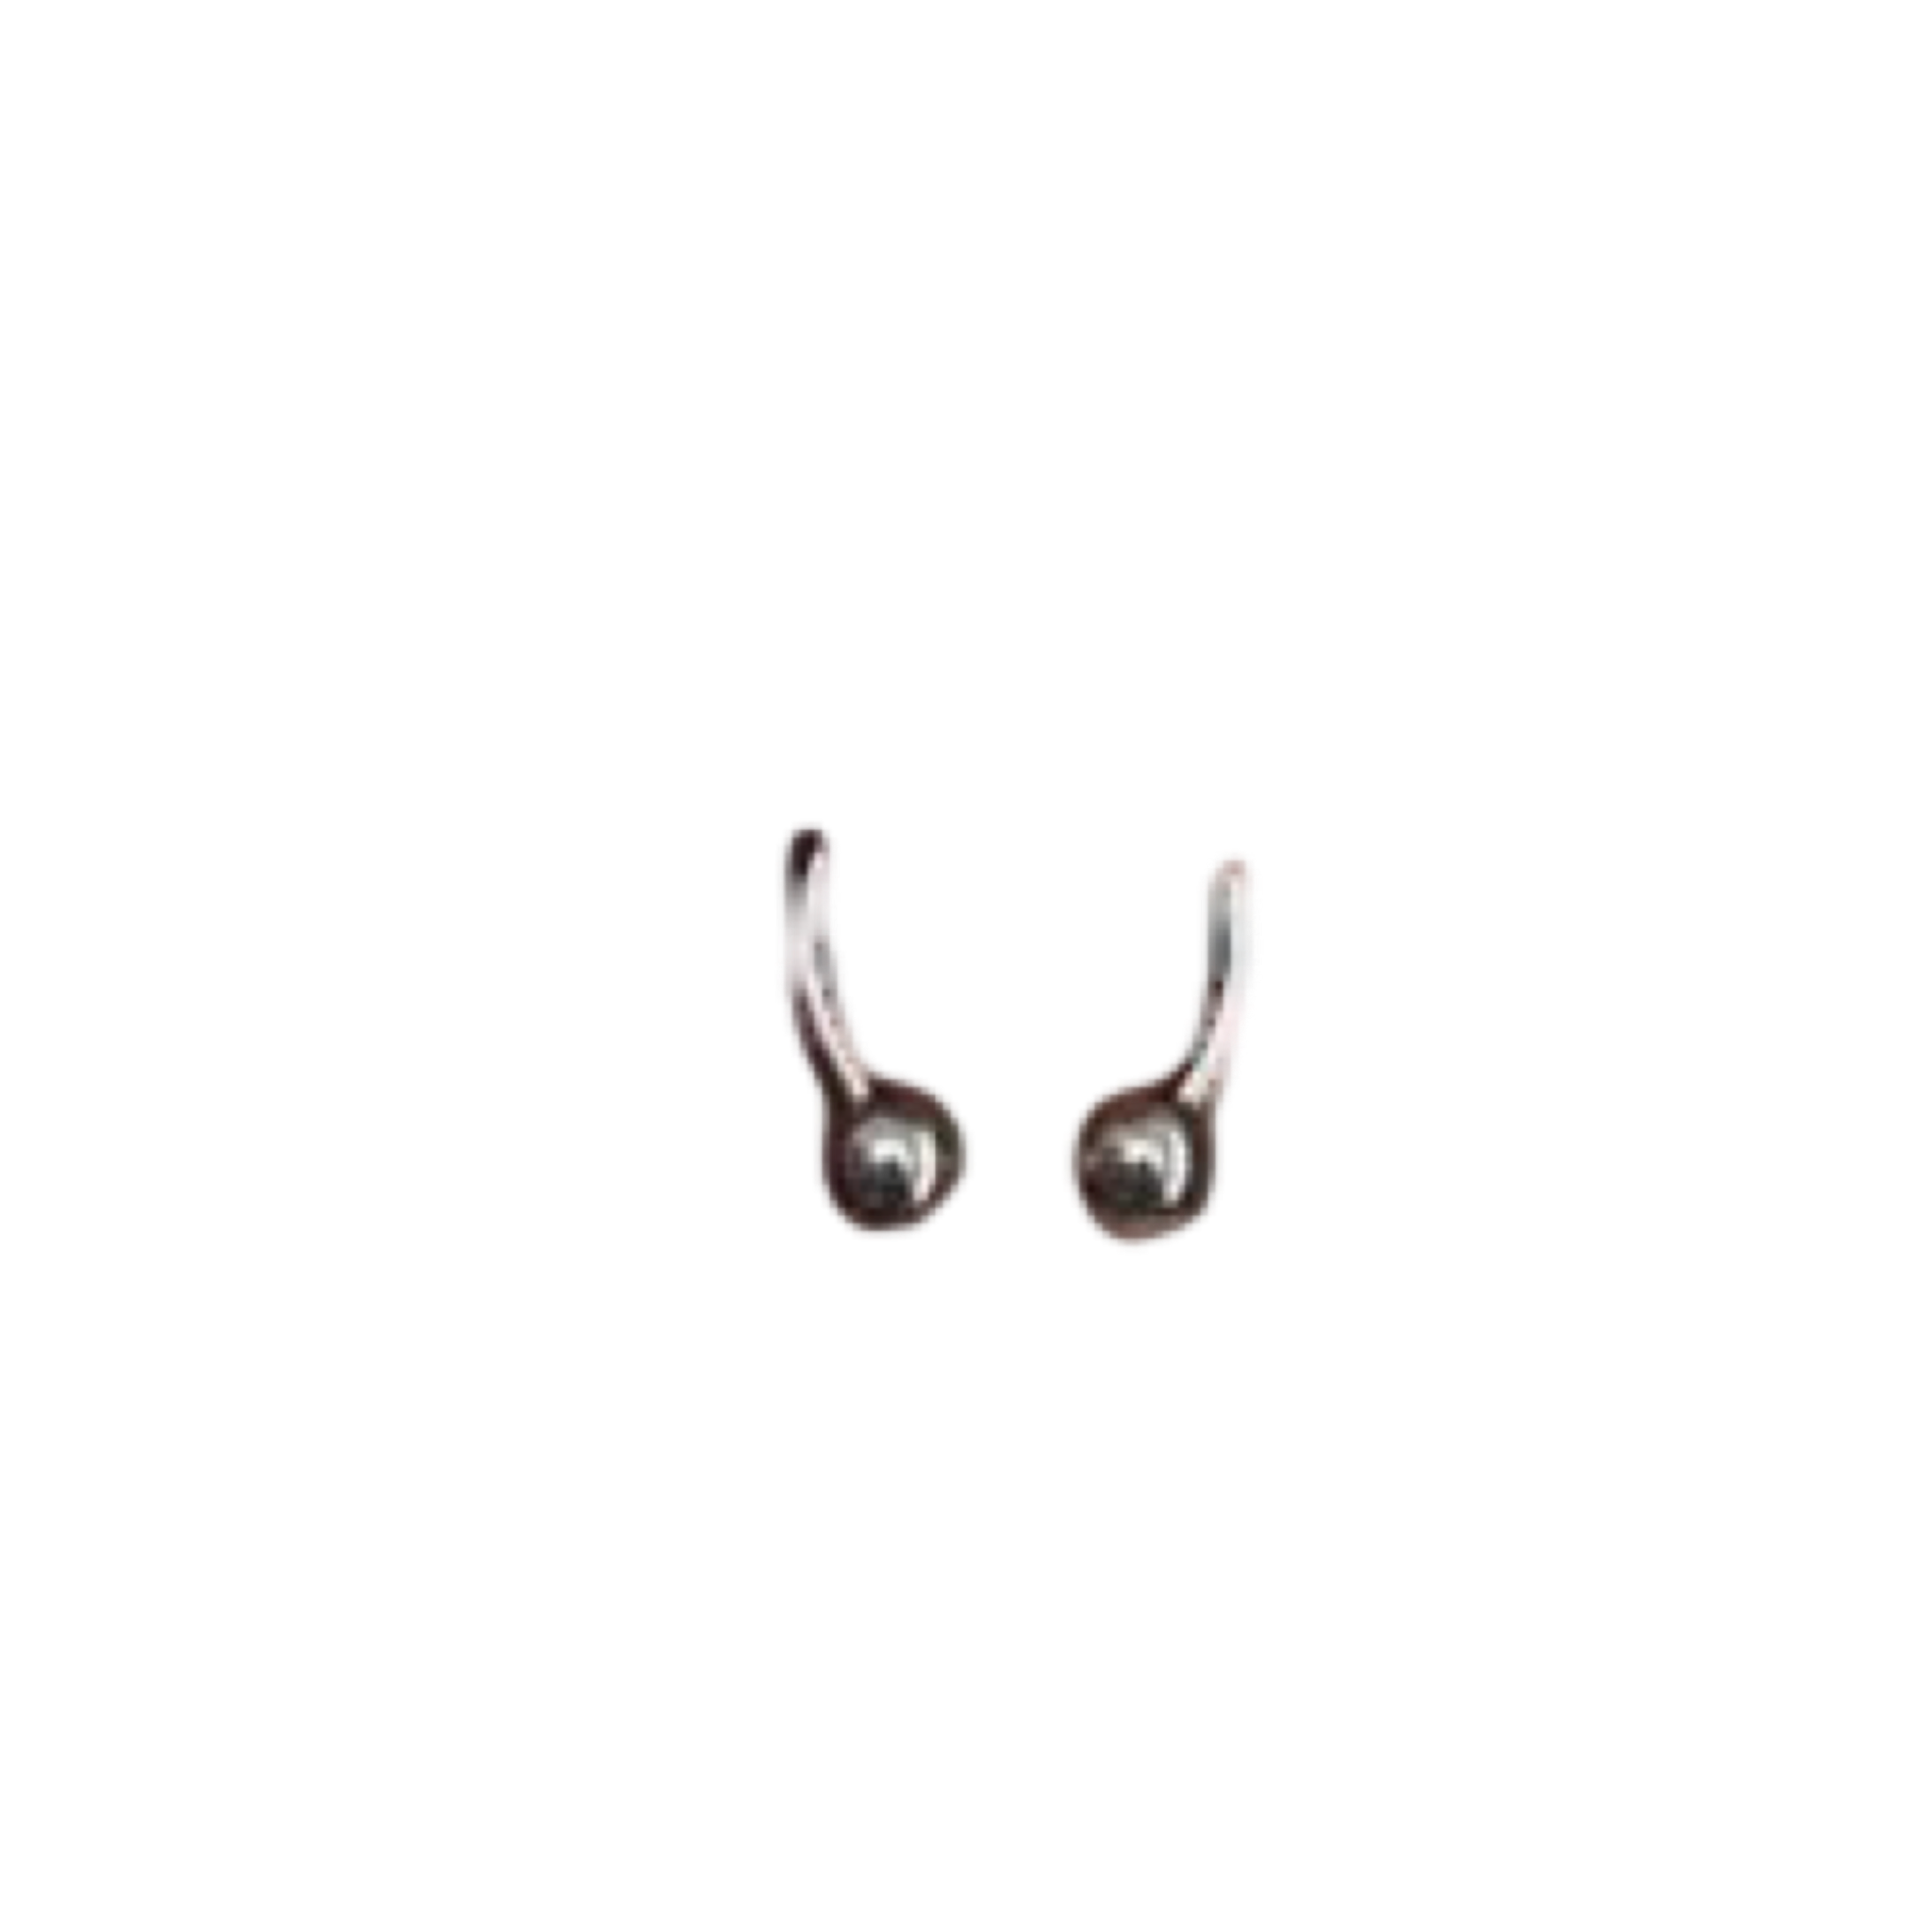 Ears Ring In The Sun